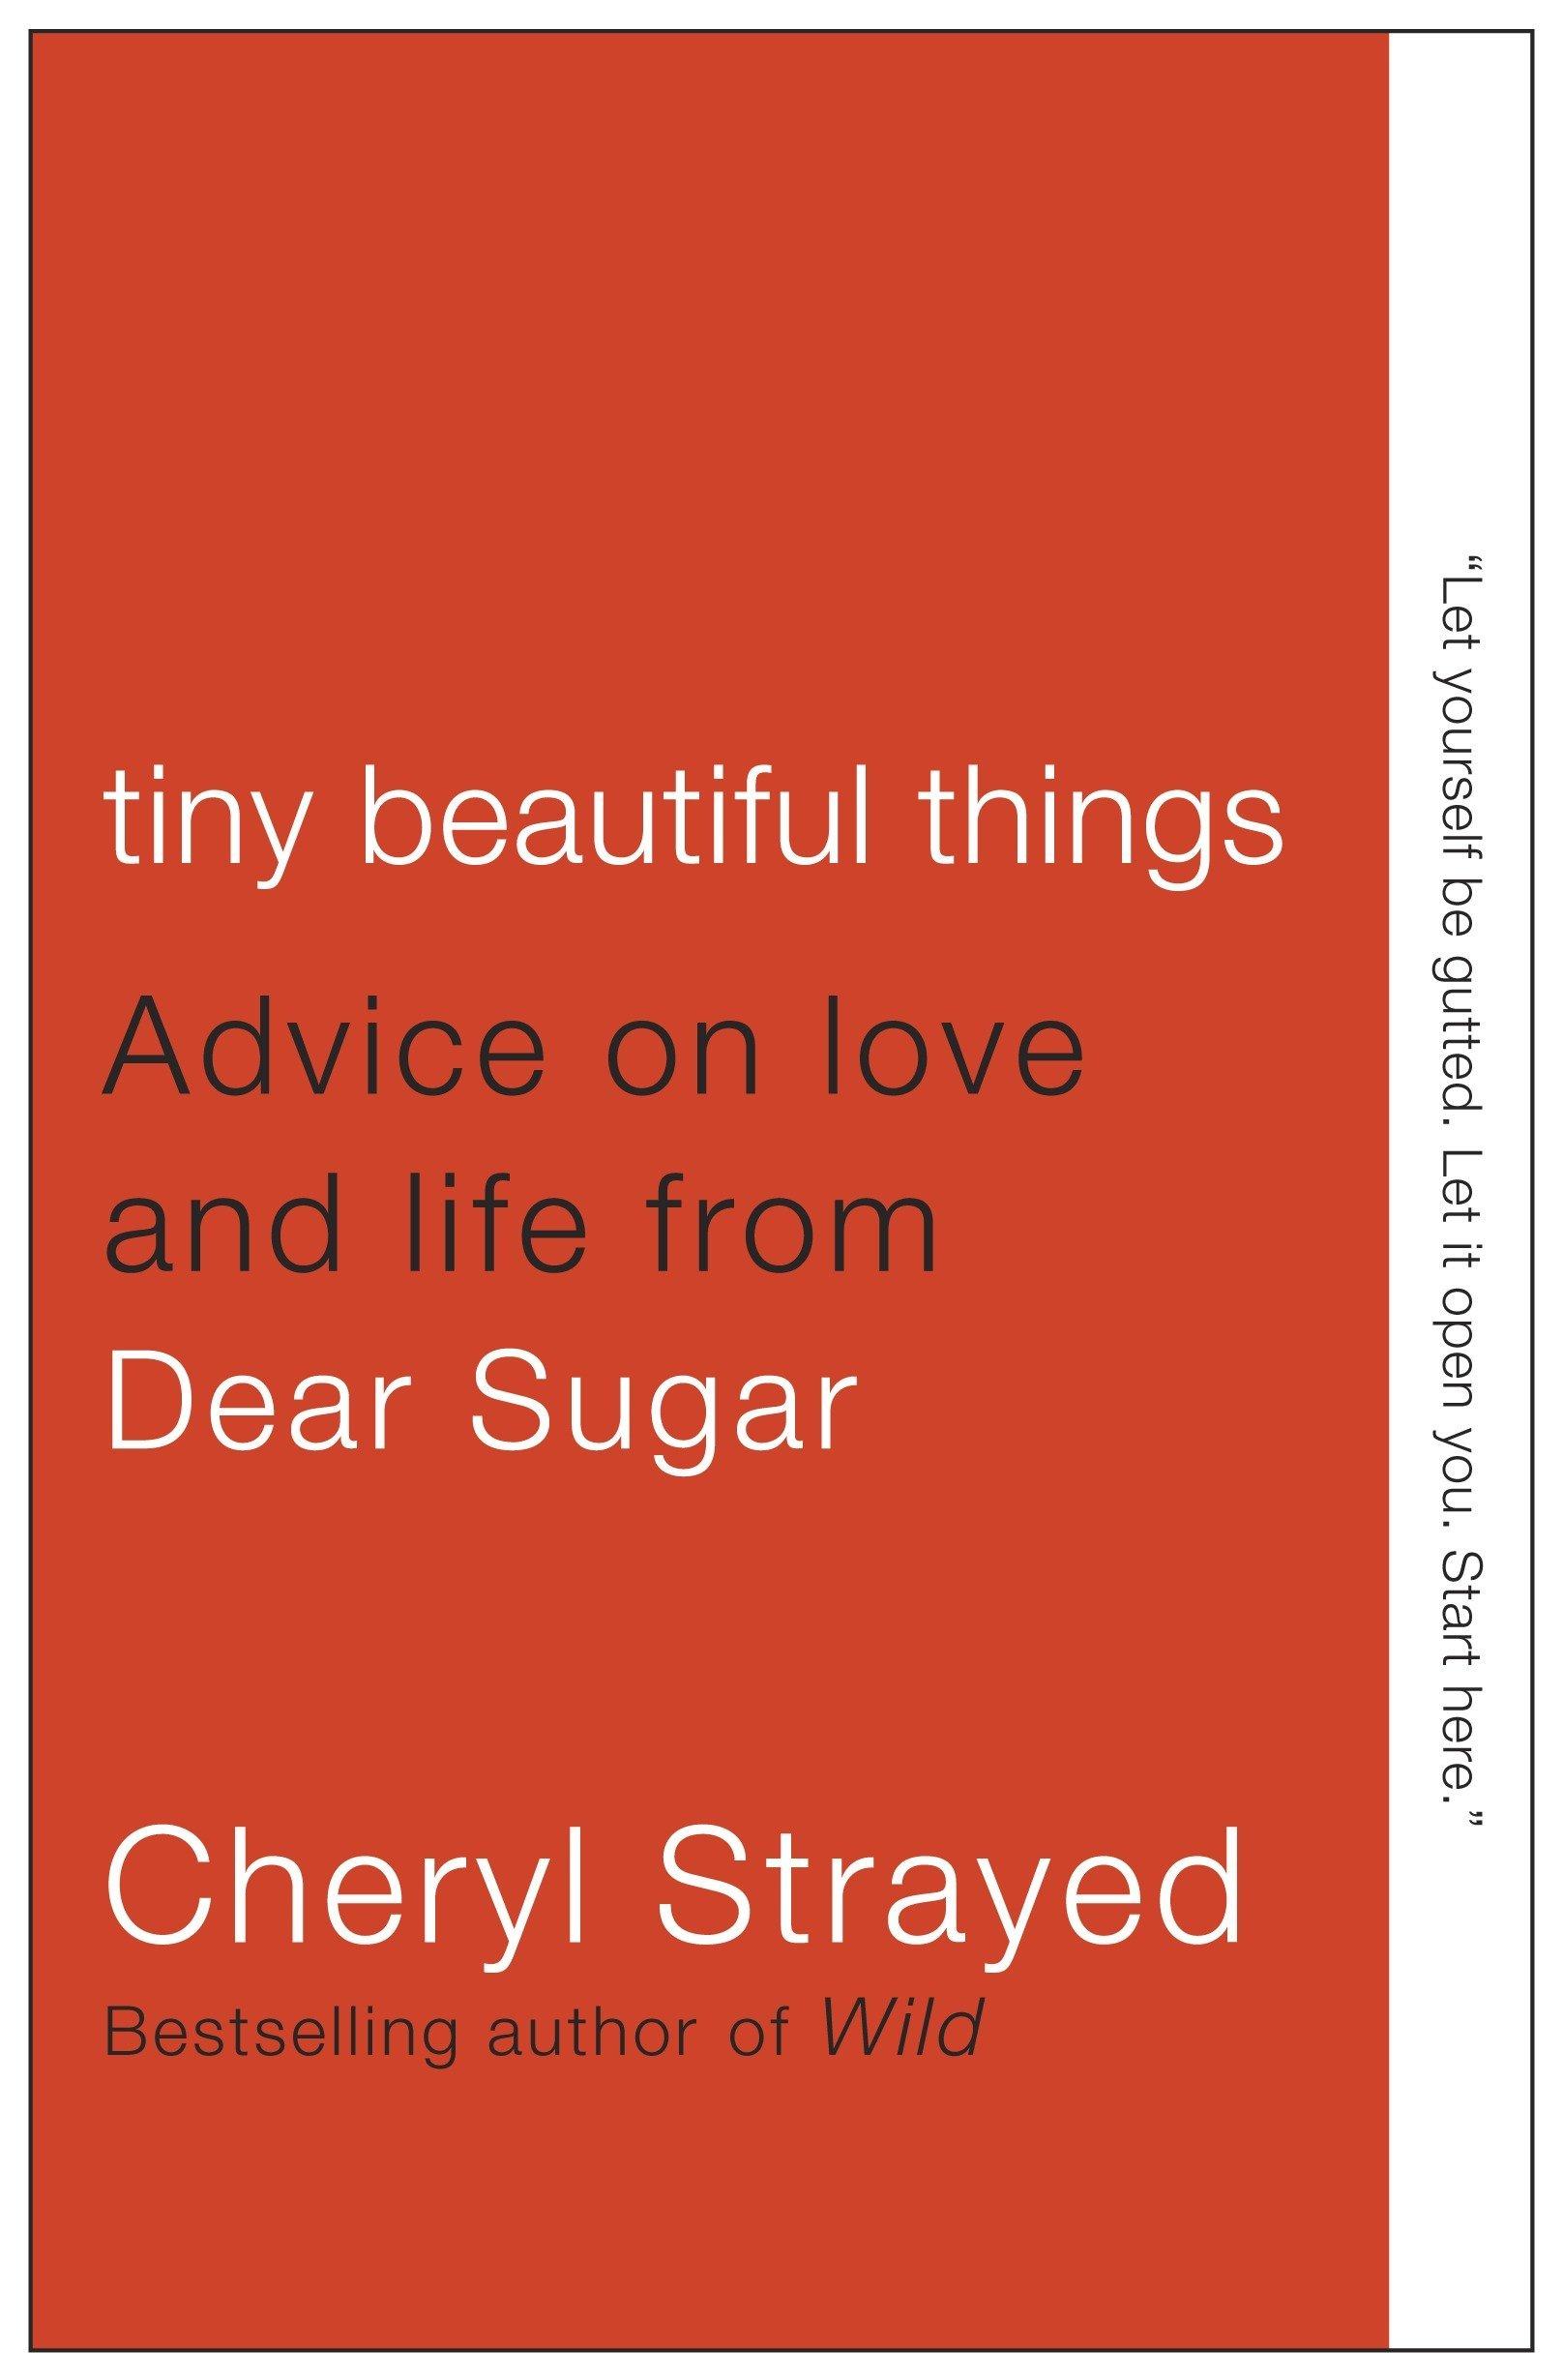 tiny beautiful things by cheryl strayed.jpg